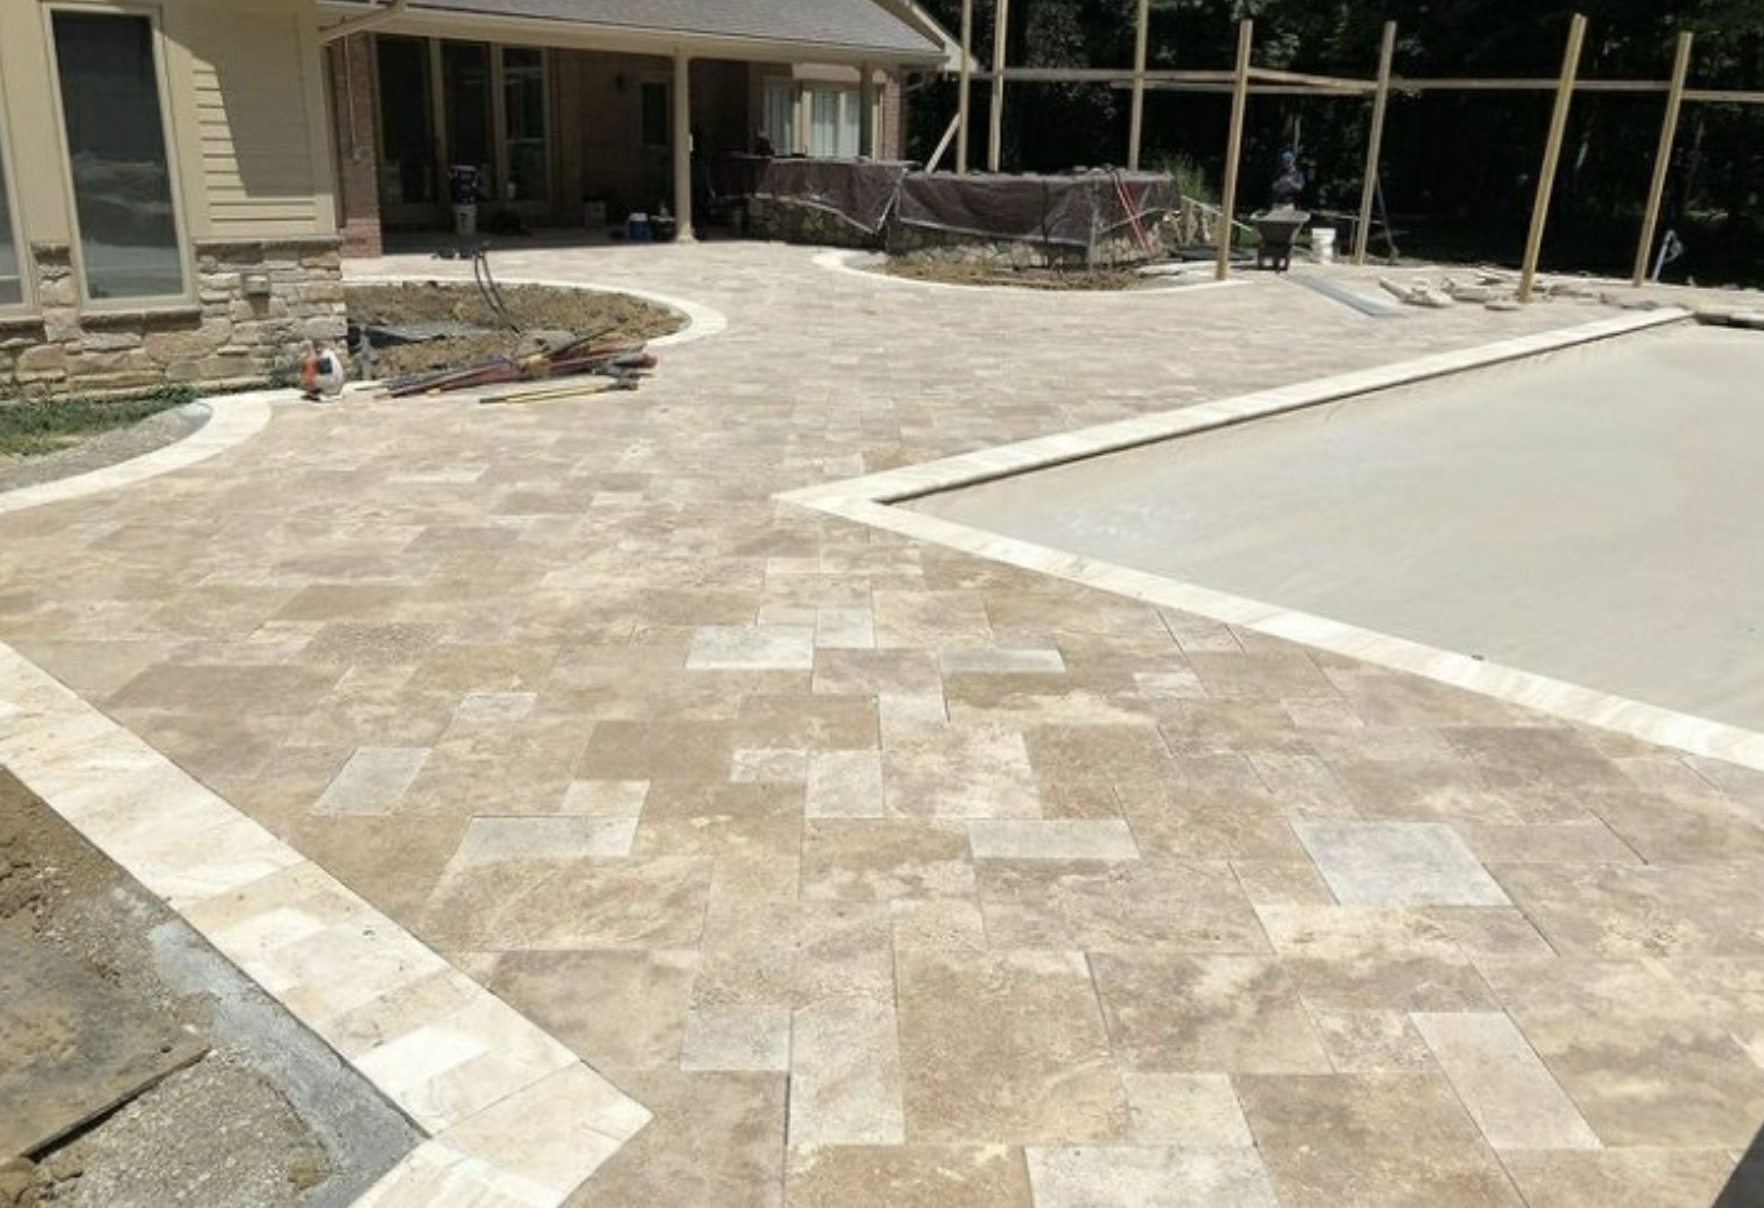 this image shows patios in Aliso Viejo, California